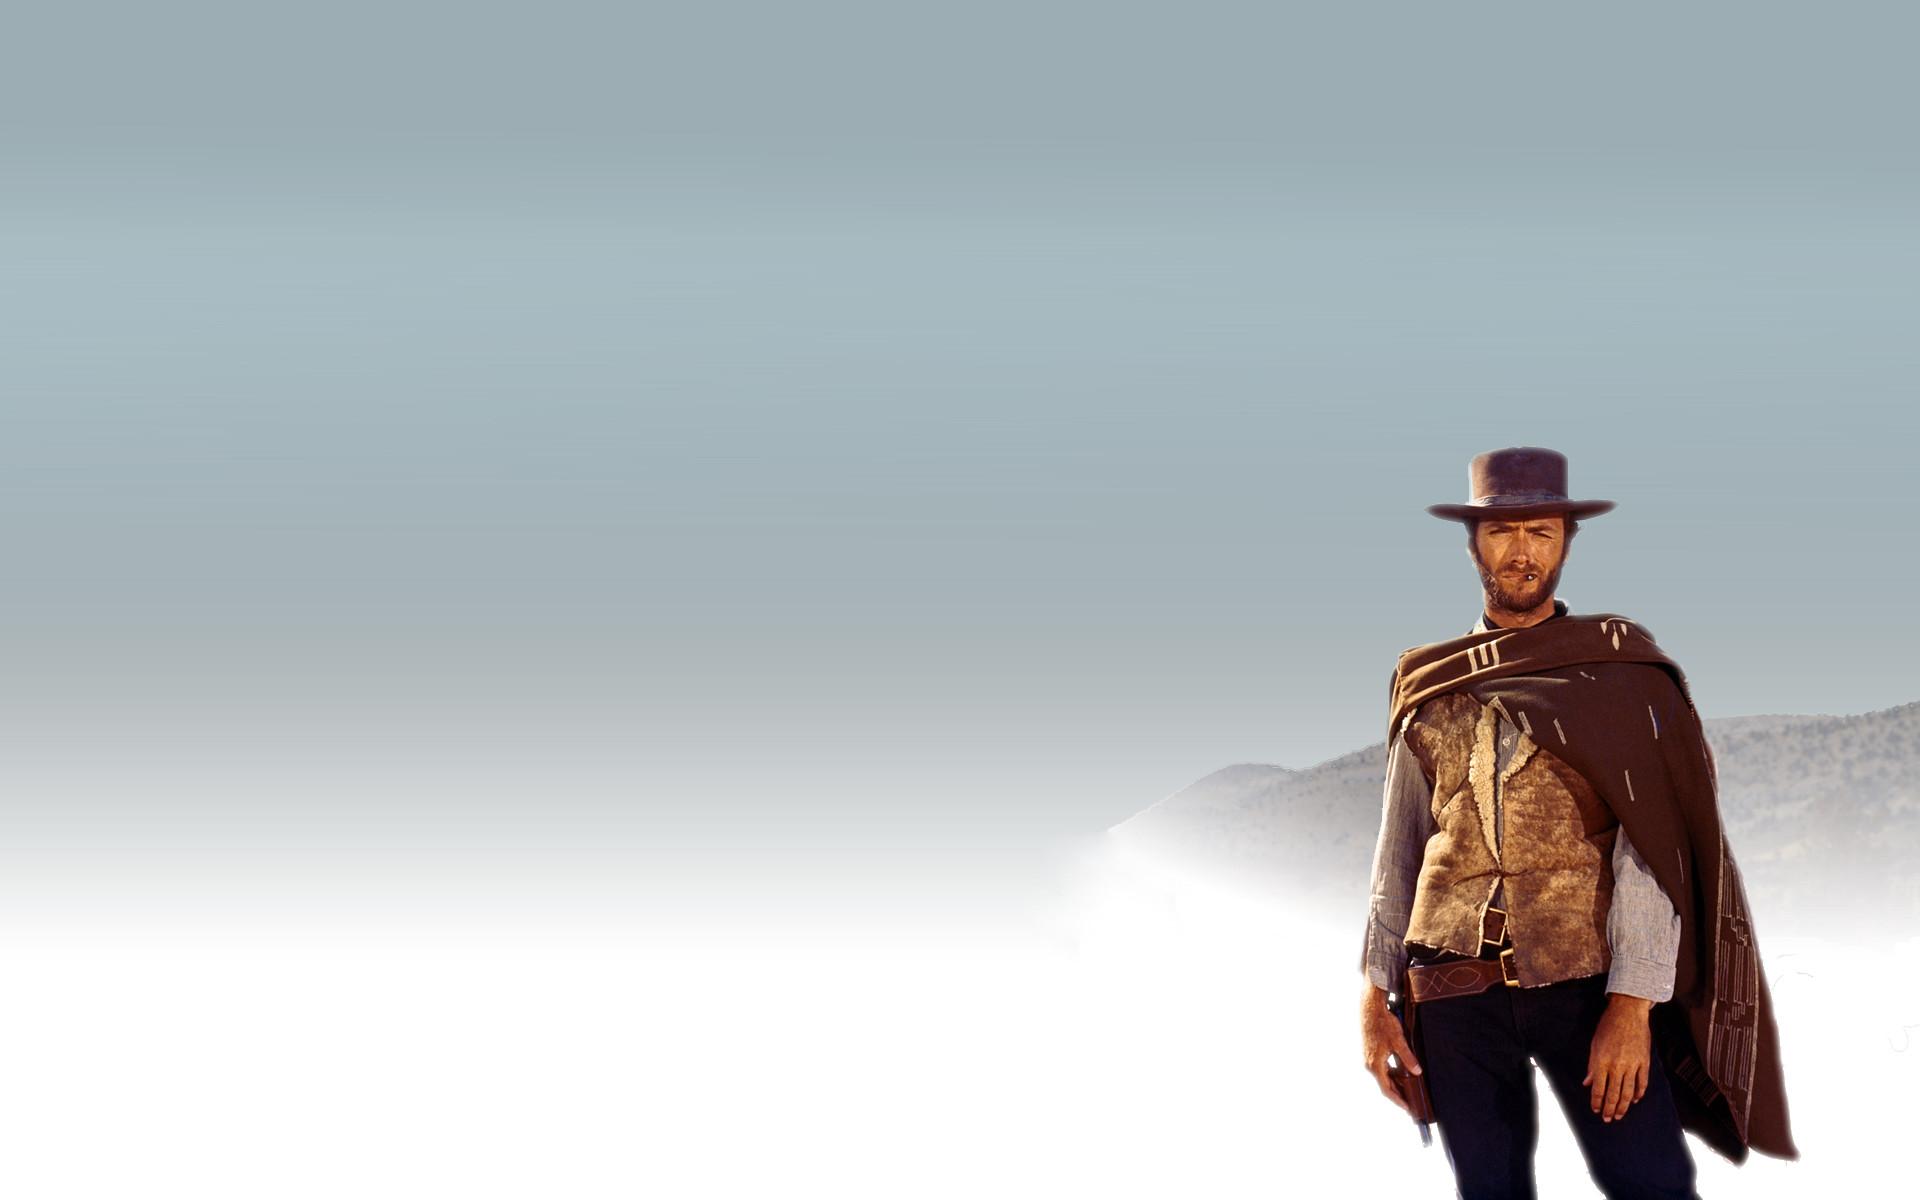 397 Clint Eastwood Wallpaper